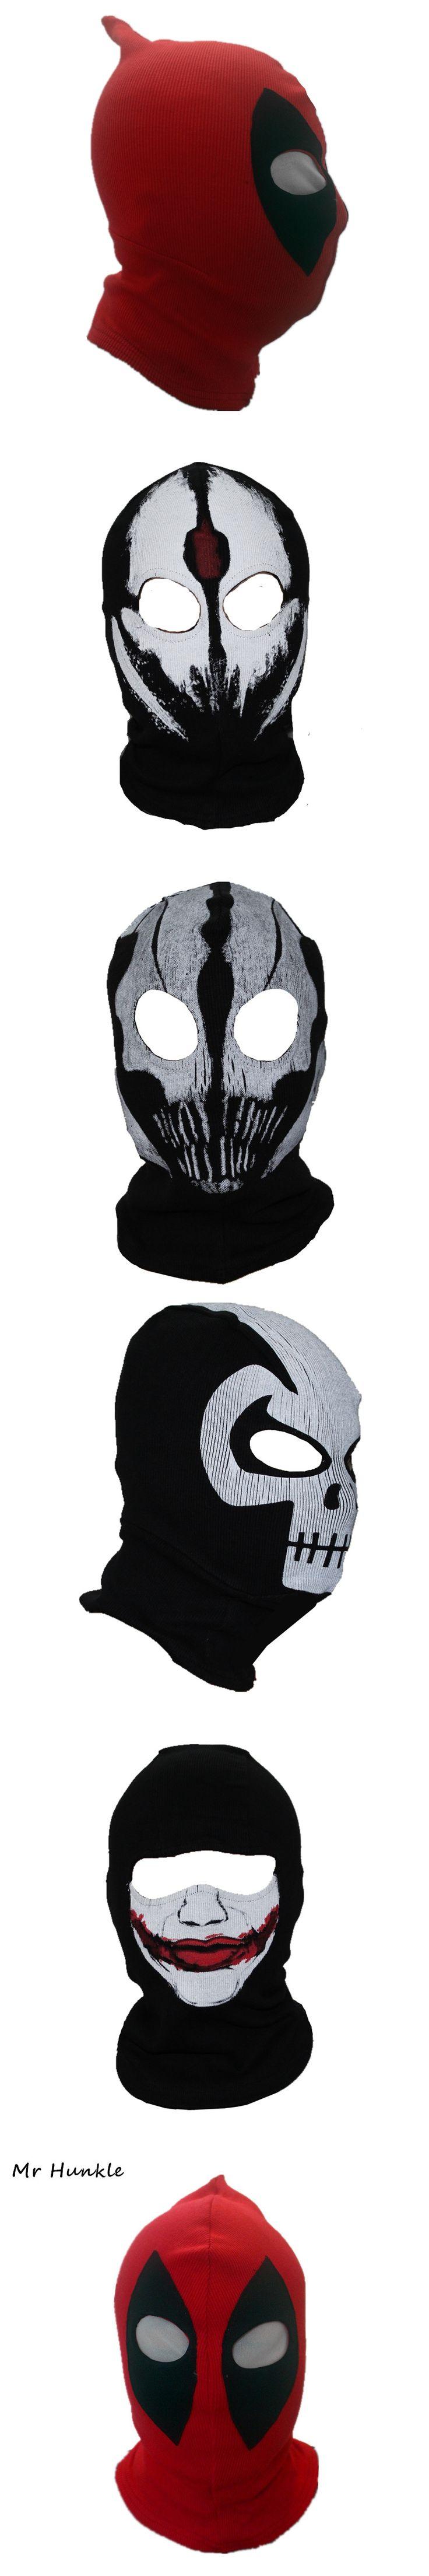 Mr Hunkle New U.S Deadl Masks JLA Balaclava Halloween Cosplay Costume Hats Headwear Deathstroke Rib Fabrics Full Face Mask